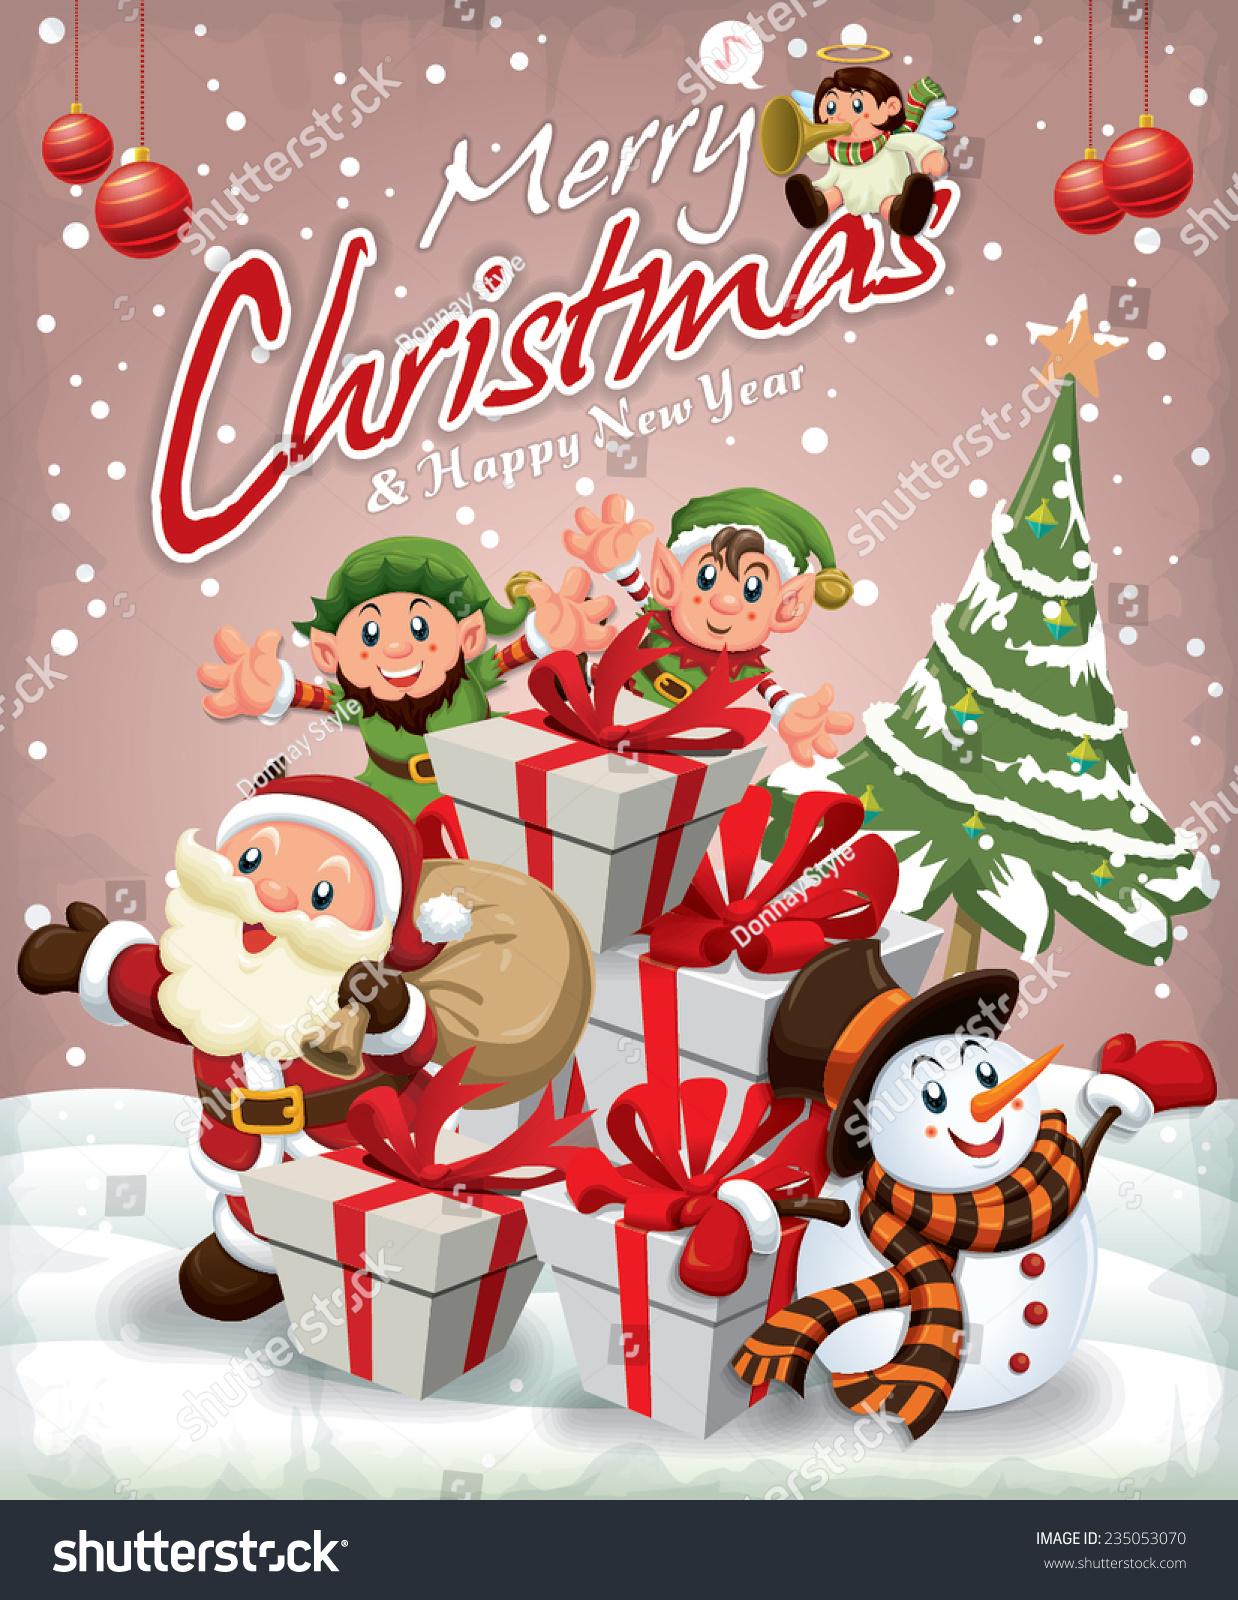 Xmas poster design - Vintage Christmas Poster Design With Santa Claus Snowman Elf Angel